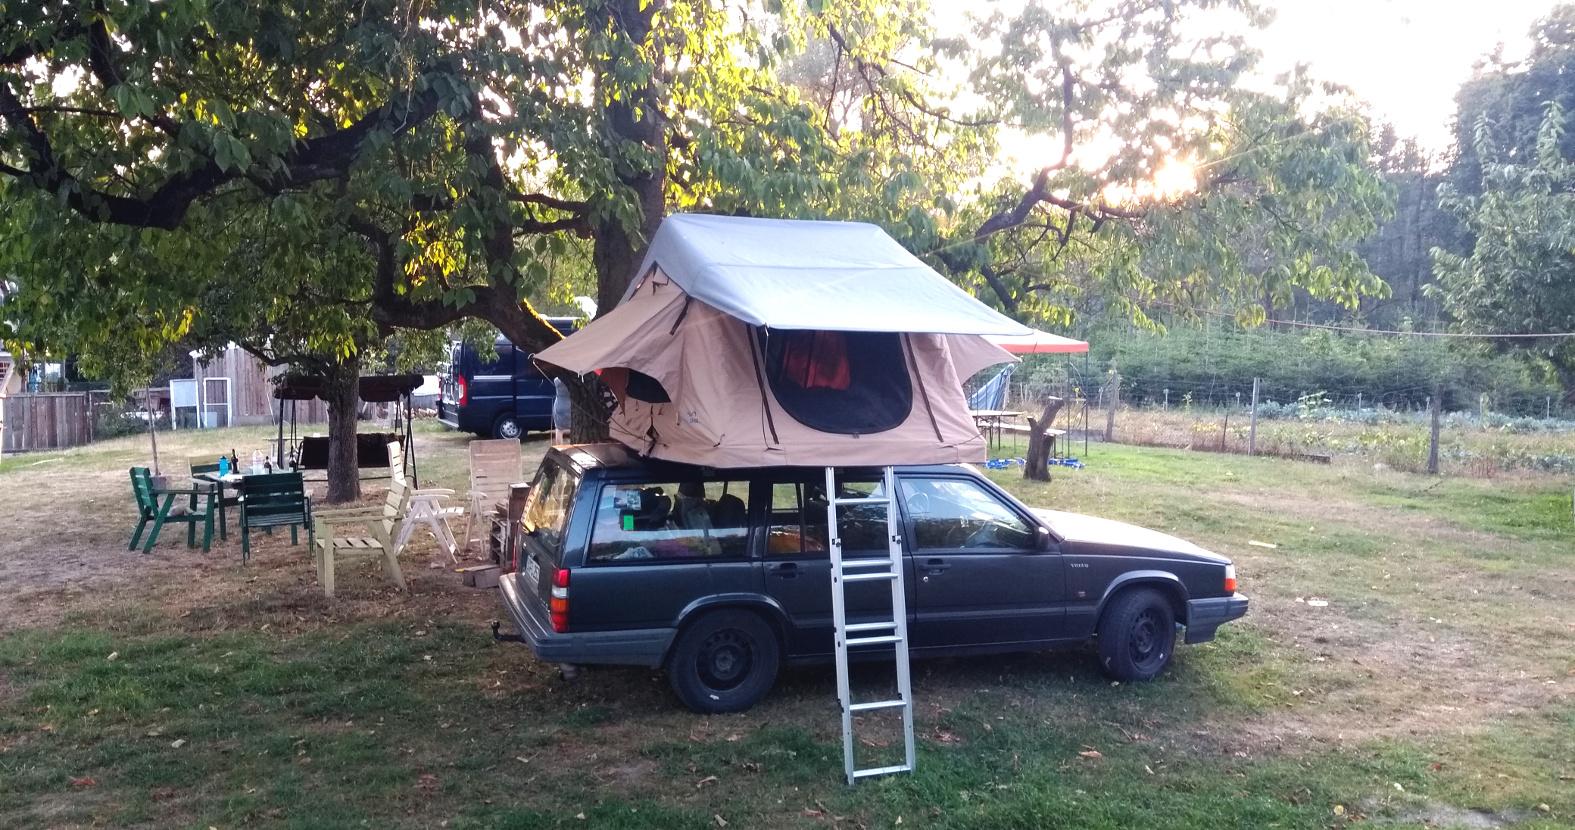 Grumsin Weltnaturerbe Camping mit Kind Bauernhof (c) www.JaegerDesVerlorenenSchmatzes.de